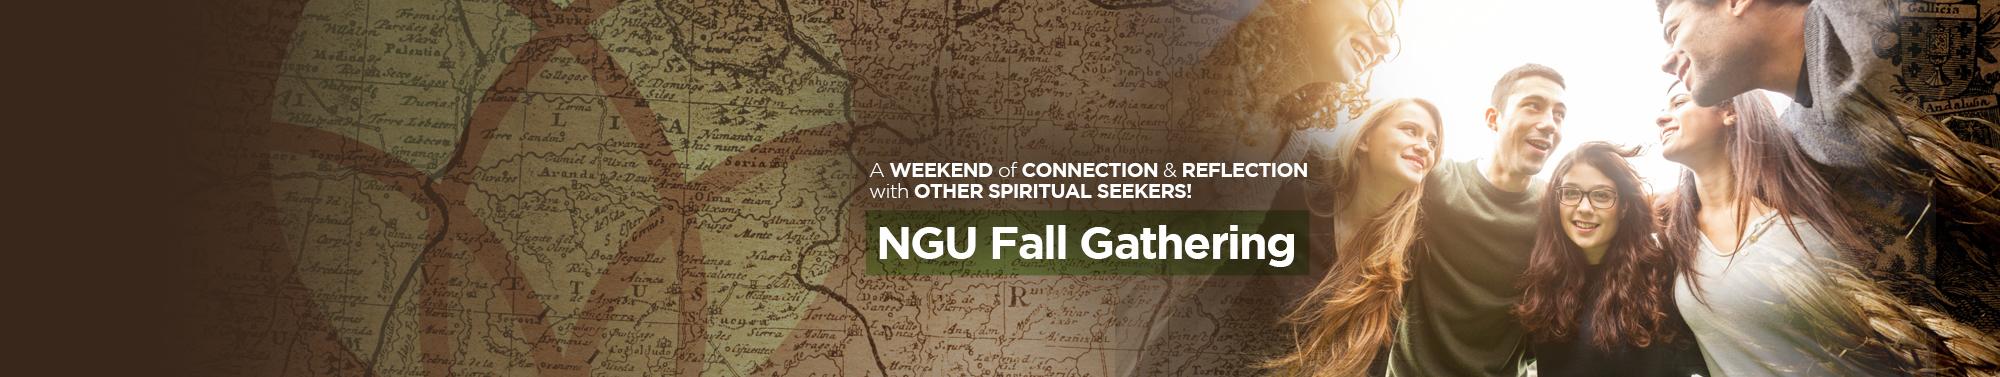 NGU Fall Gathering 2016